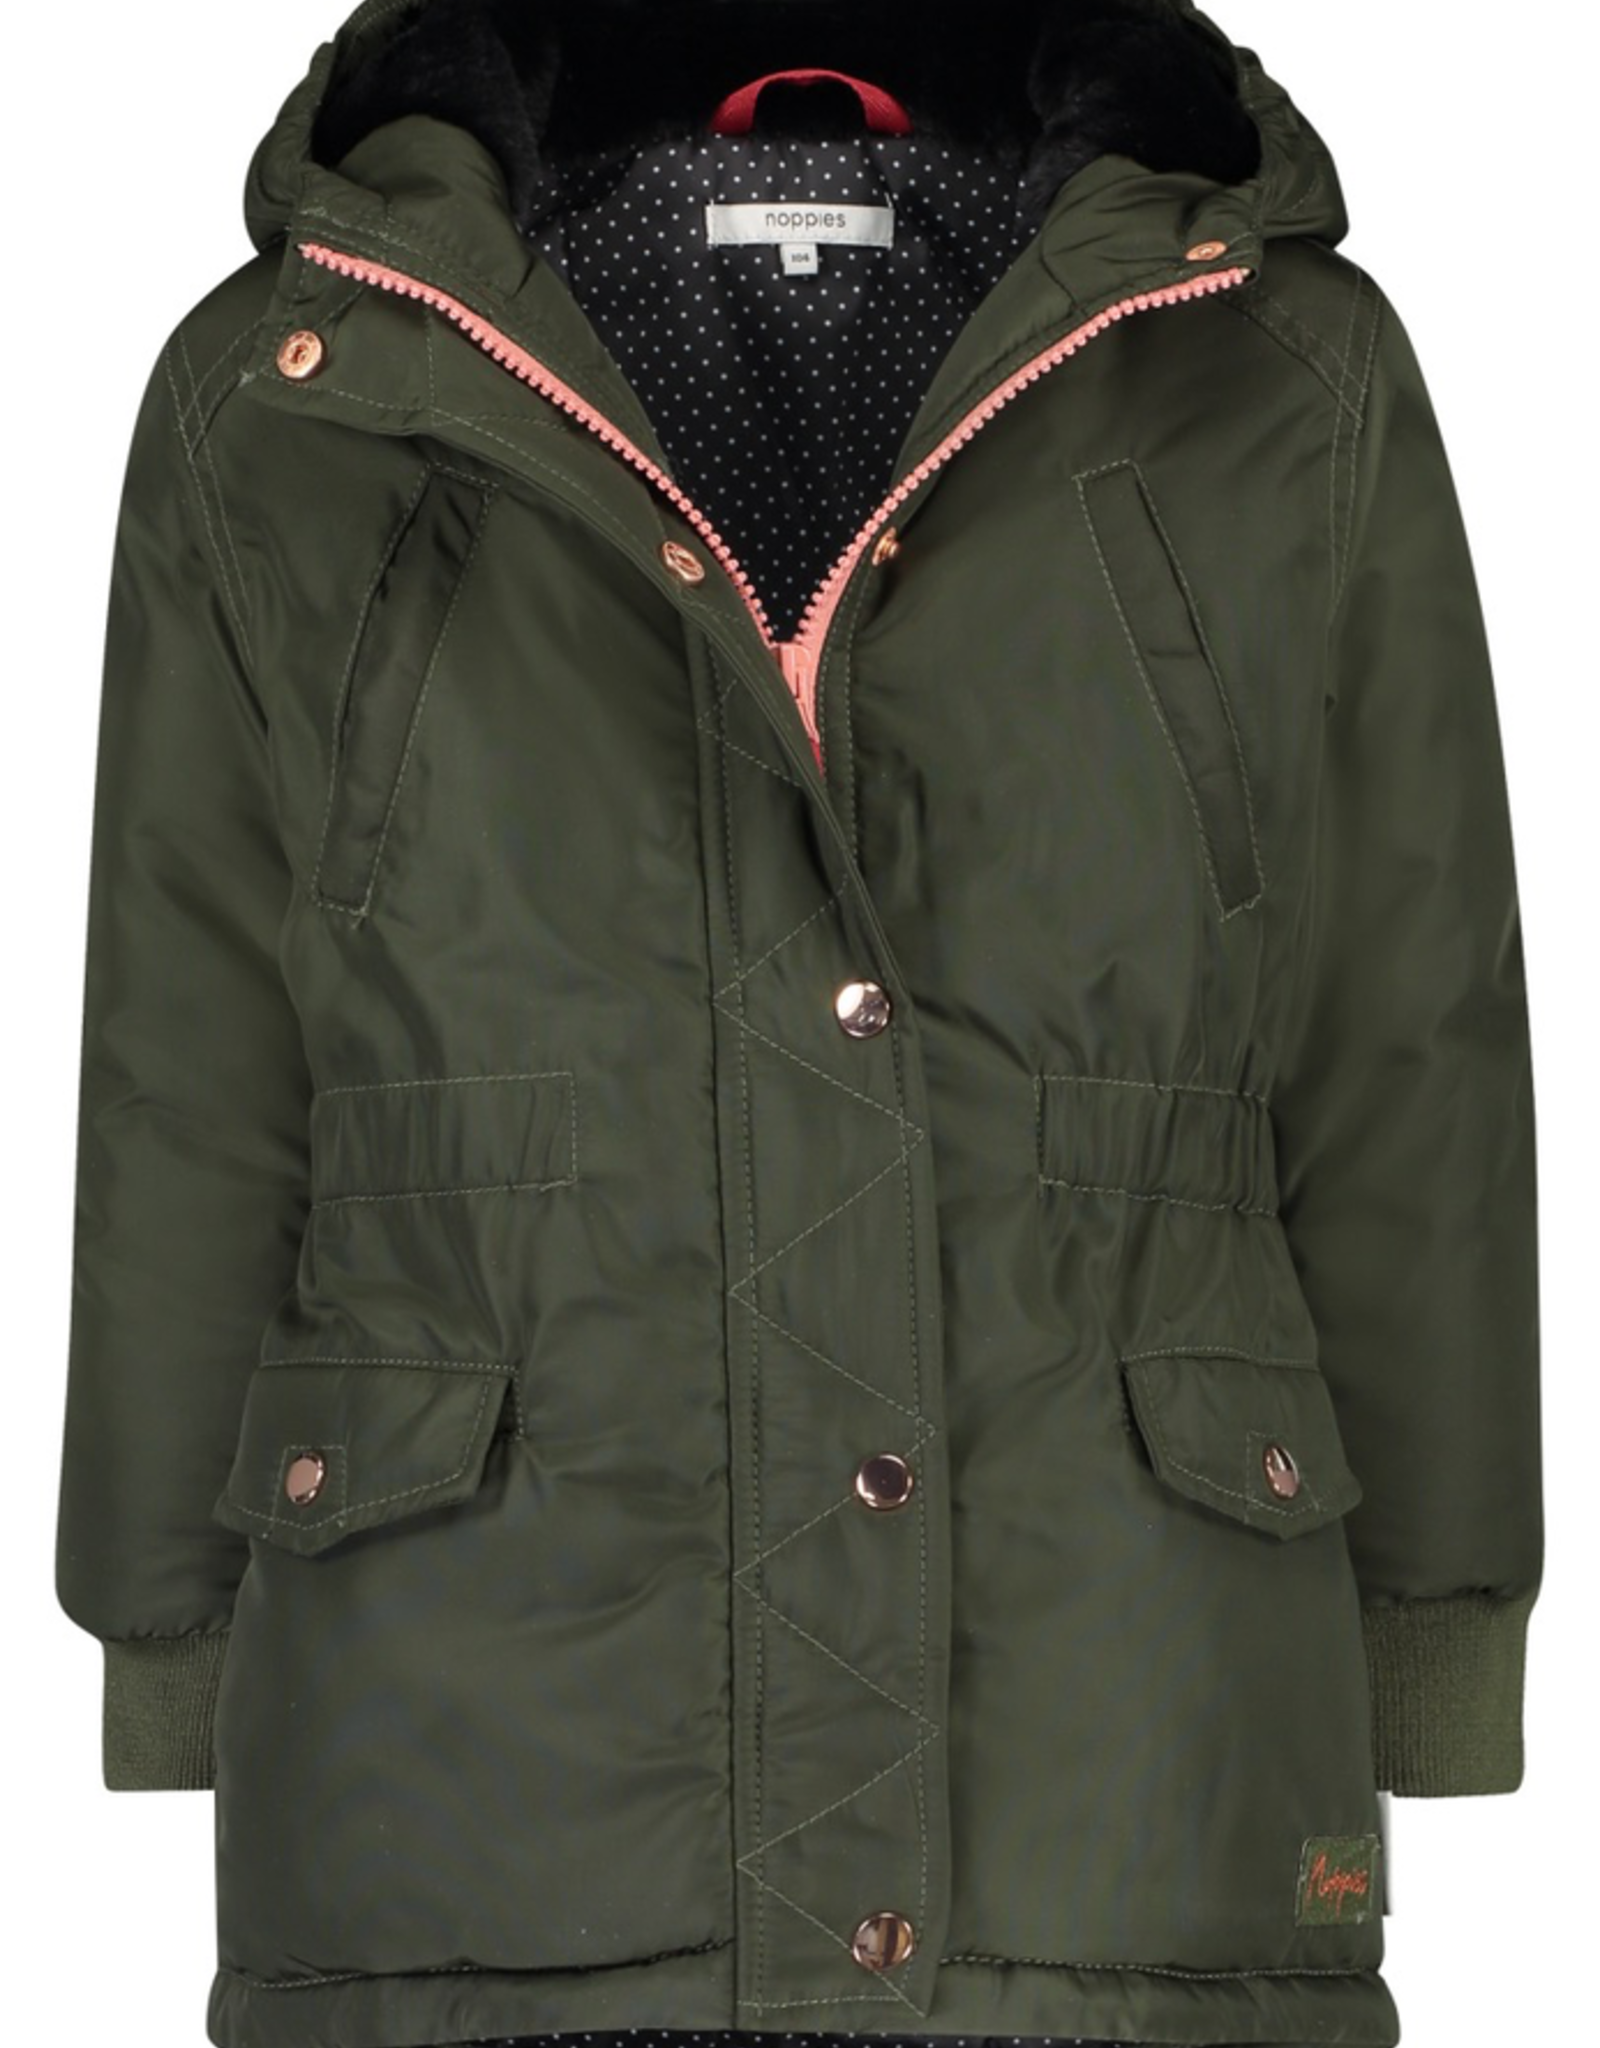 Noppies Kids Vasyl Winter Jacket for Girl